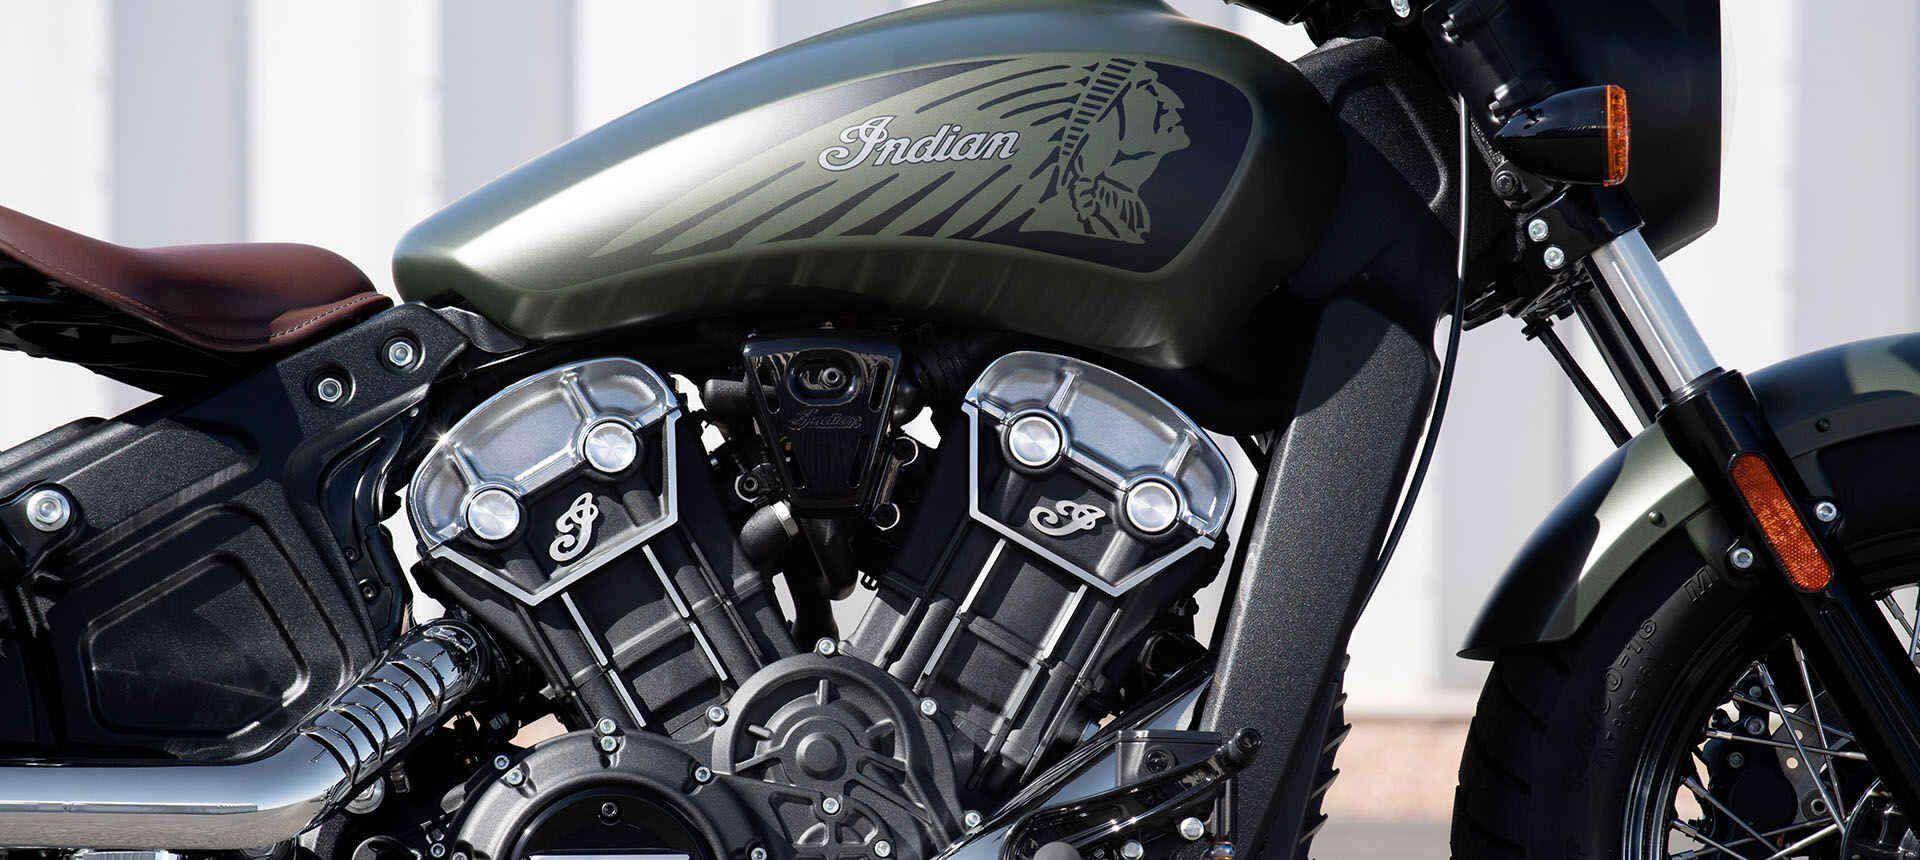 Мотоцикл Indian Scout Bobber Twenty Burnished Metallic 2020 - 3